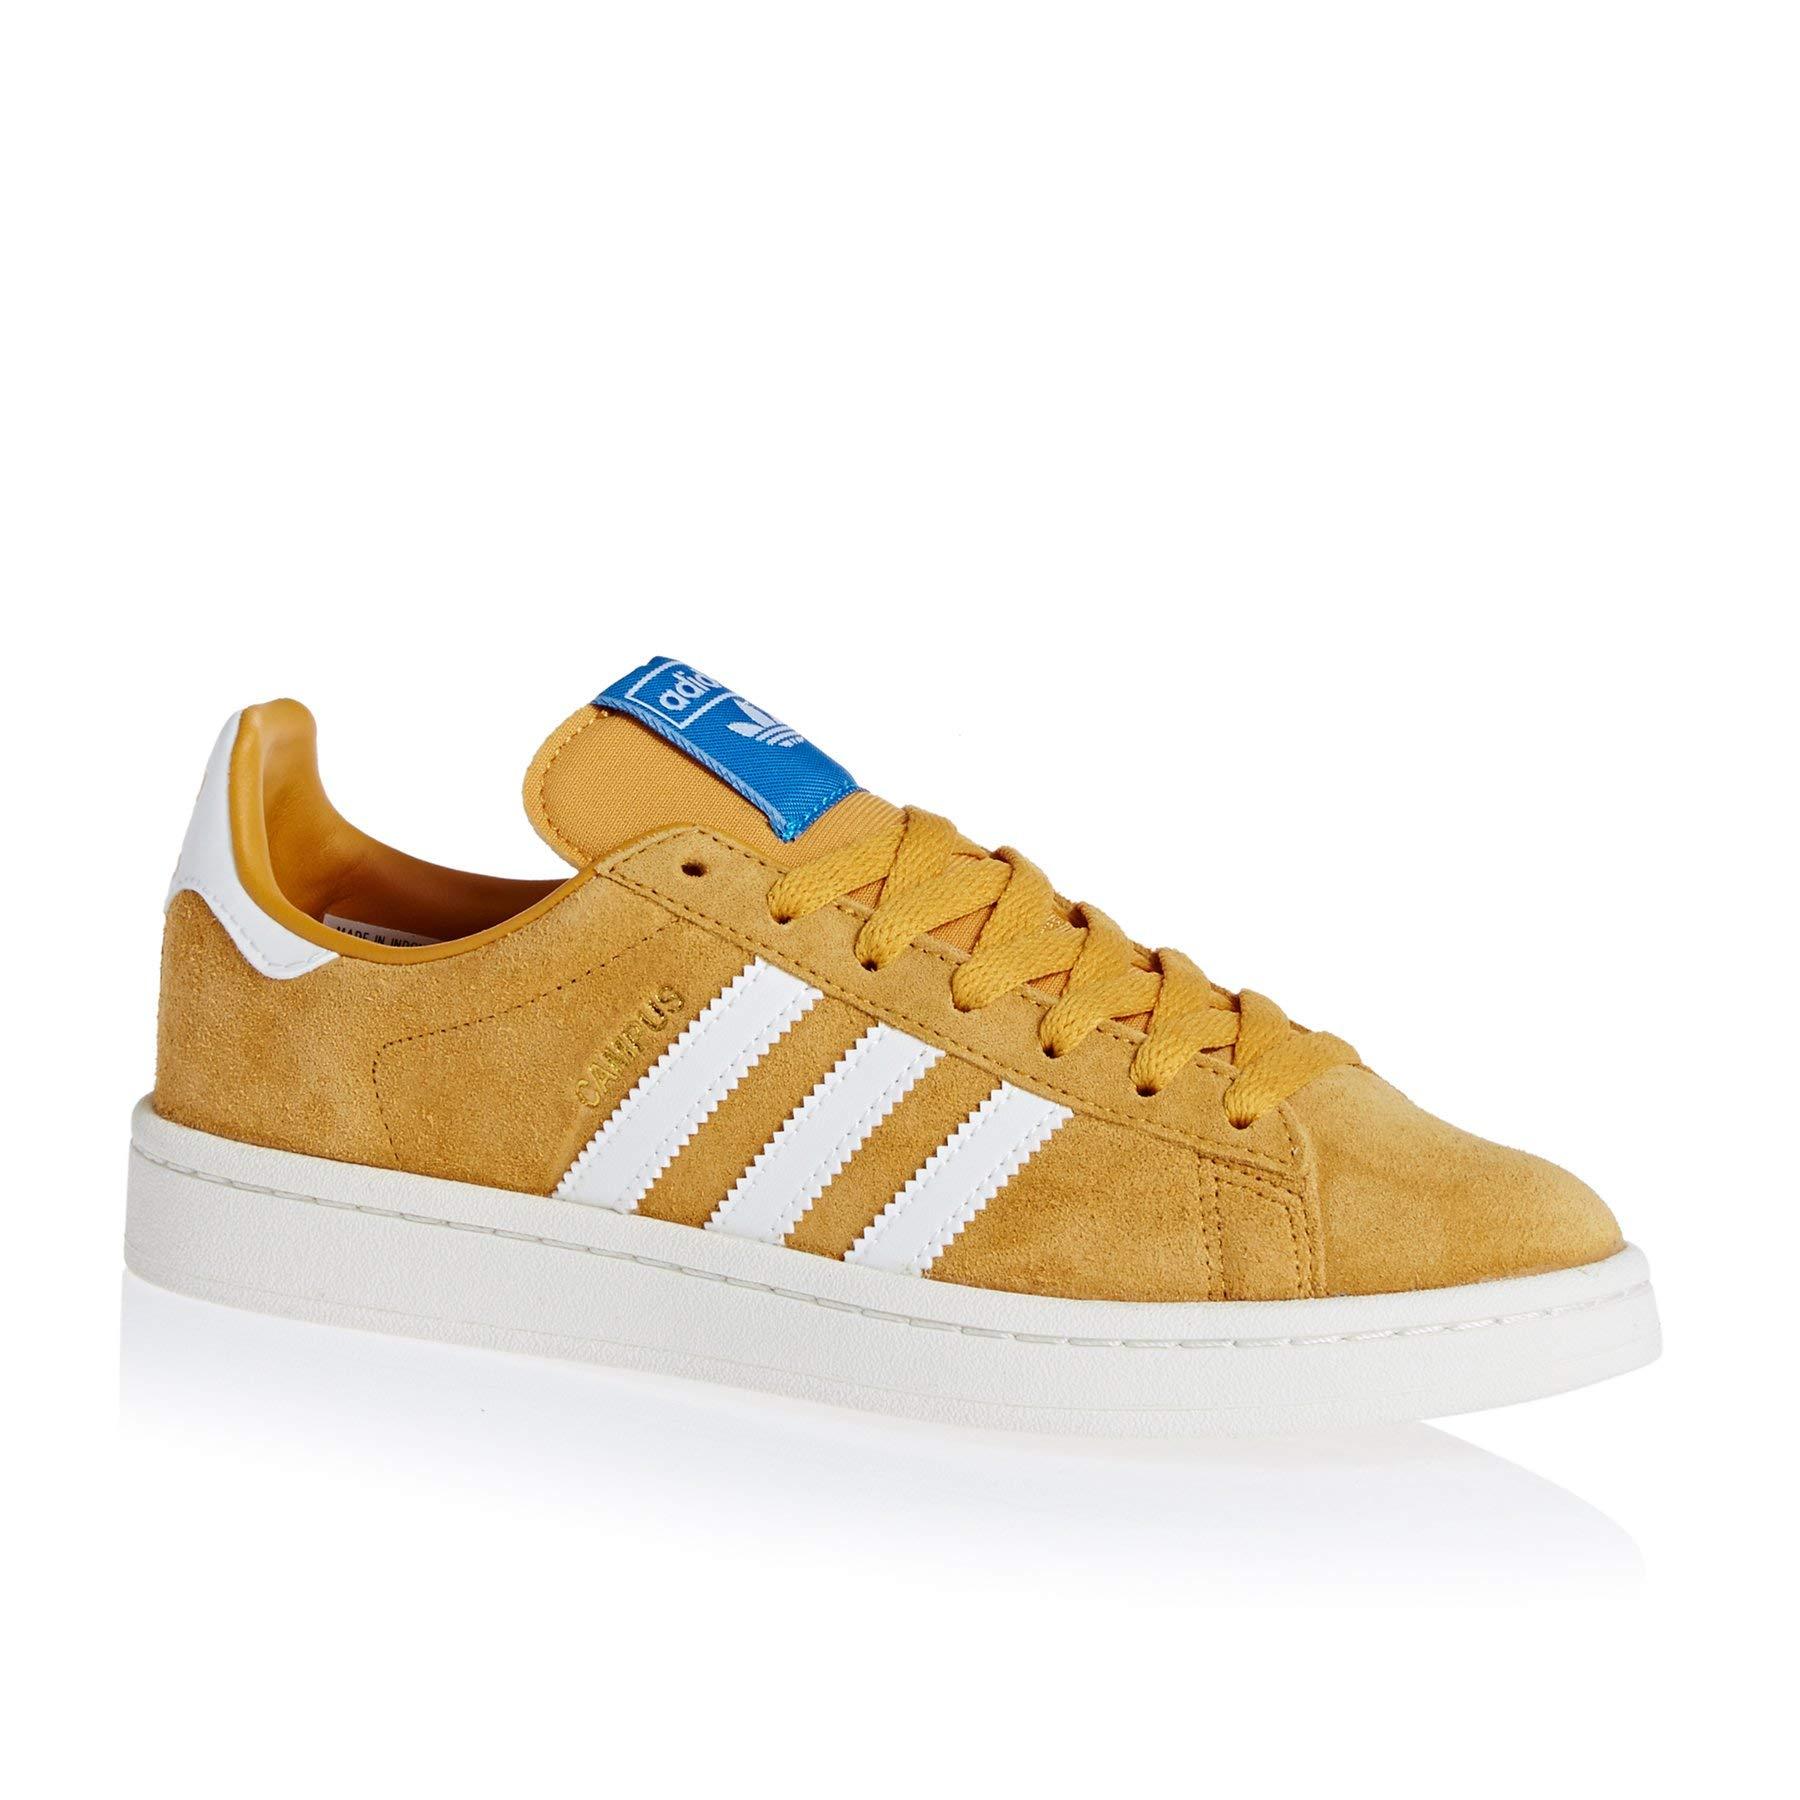 5dd7541cd566 Galleon - Adidas Originals Campus Shoes 11.5 B(M) US Women   10.5 D(M) US  Tacyel clowhi cwhite